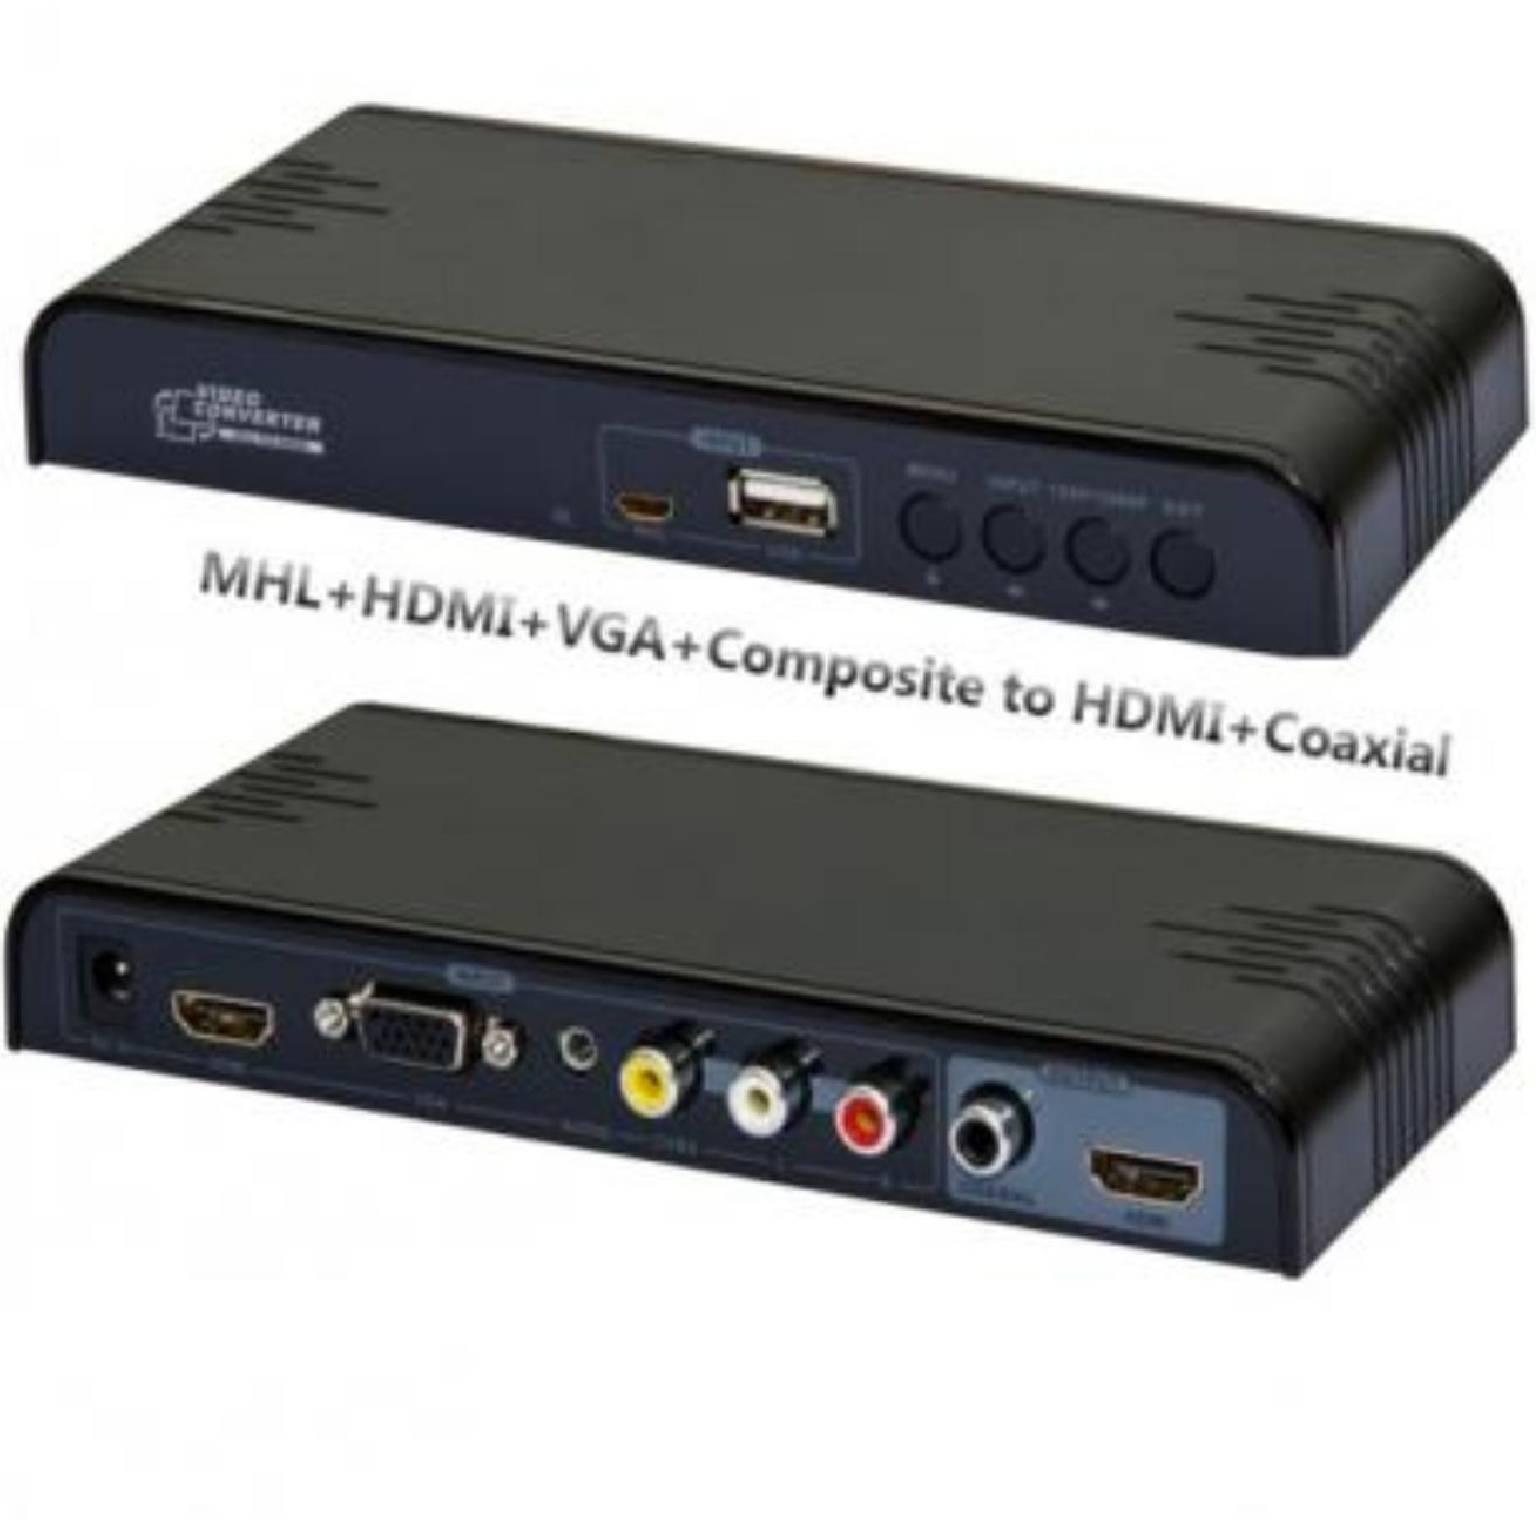 MHL HDMI VGA Composiet naar HDMI omvormer Uitgang: HDMI en Digitaal coaxiaal